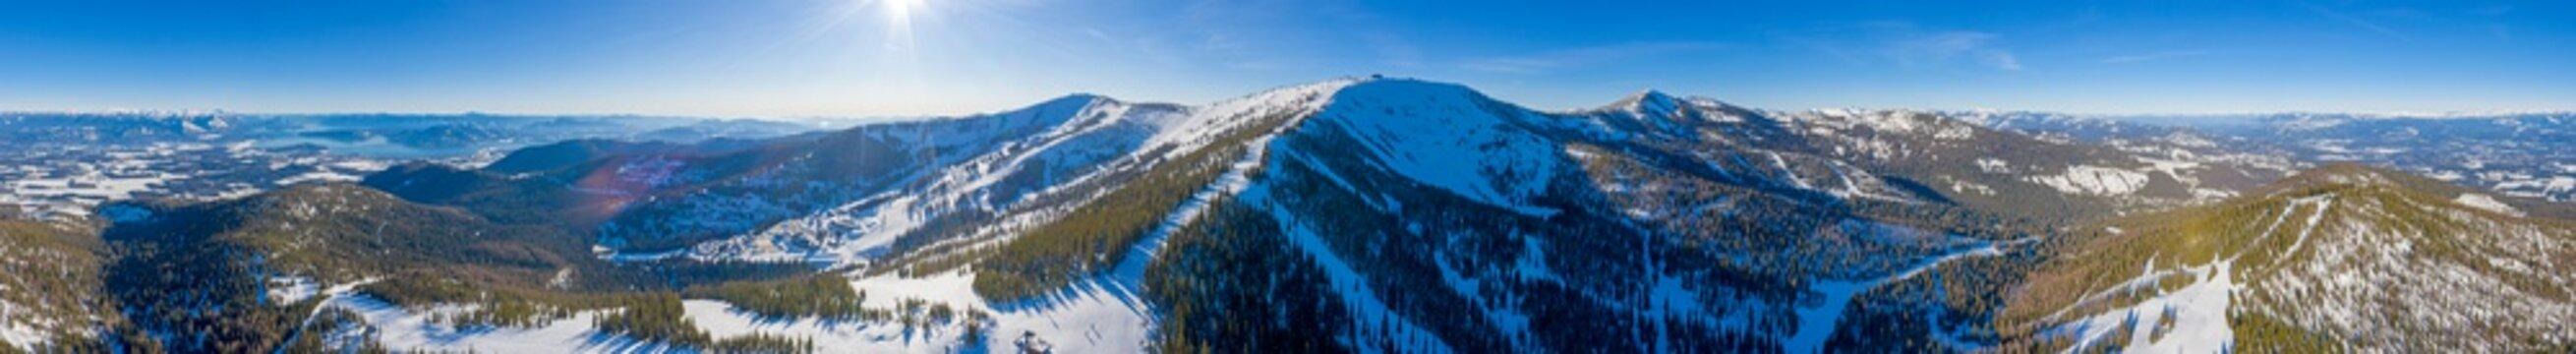 Schweitzer Idaho Ski Area 360 Panoramic Winter Mountain Aerial View